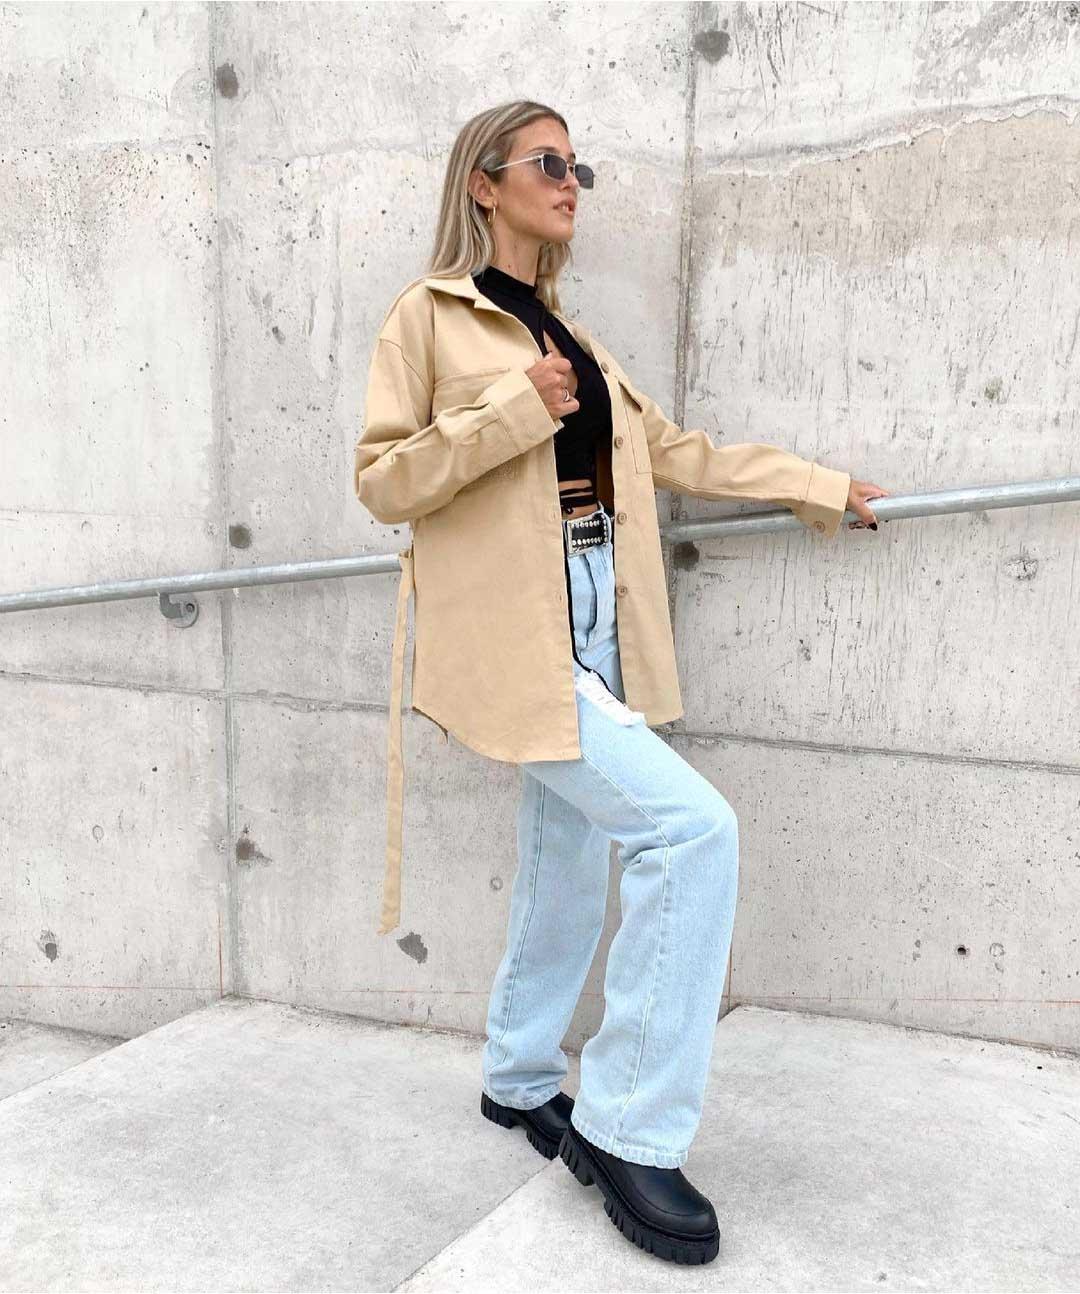 pantalones rectos tiro alto mujer invierno 2021